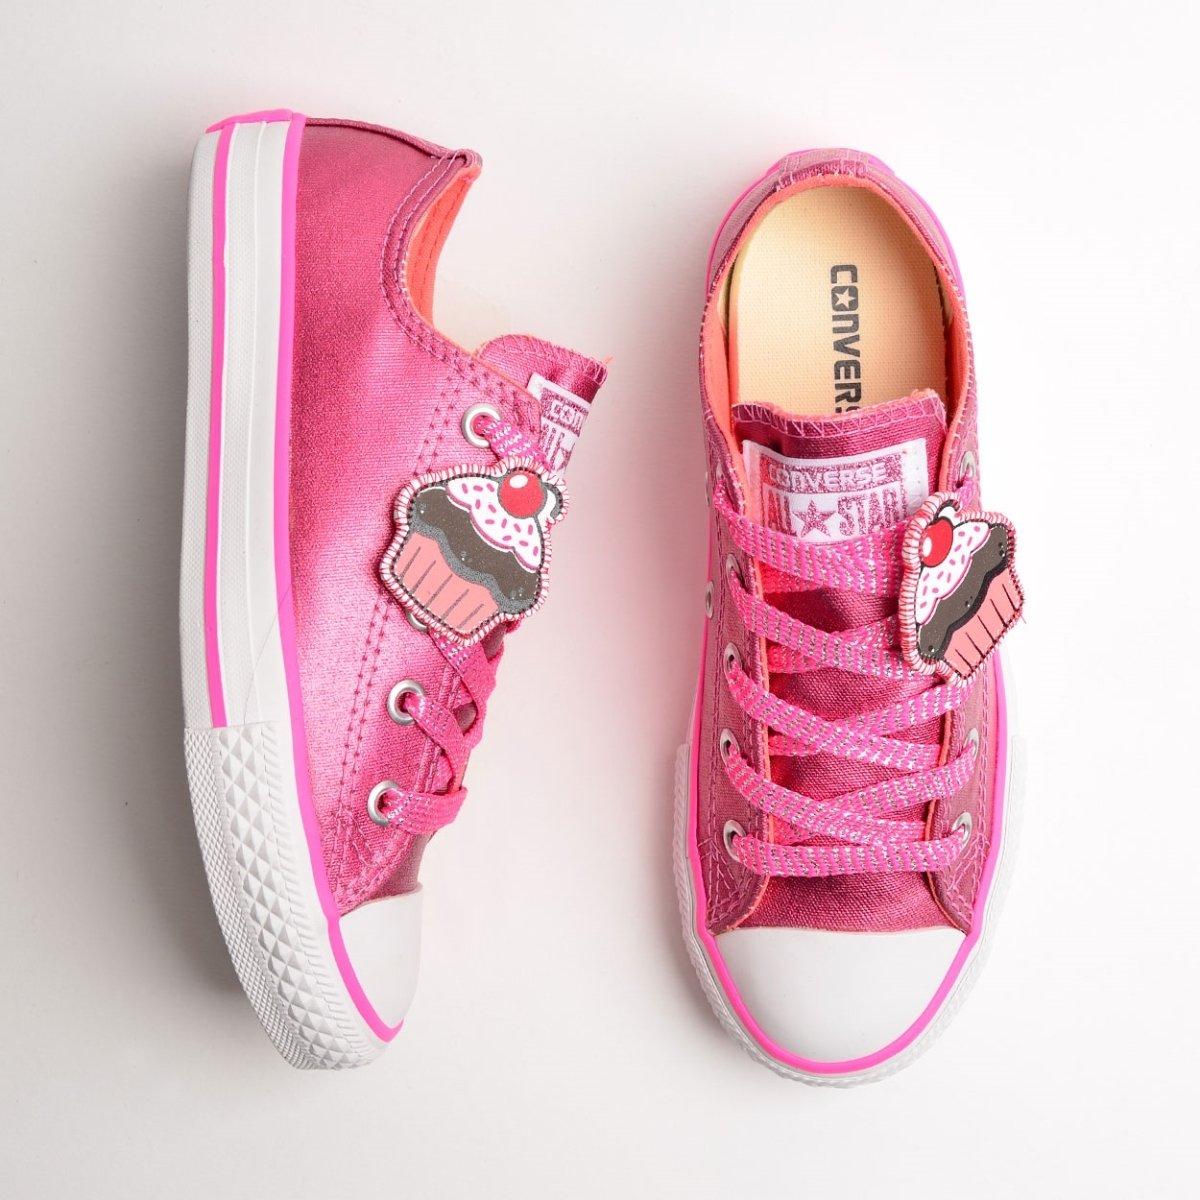 cebea789a Tênis Converse Chuck Taylor All Star Kids Rosa Ch - Compre Agora ...